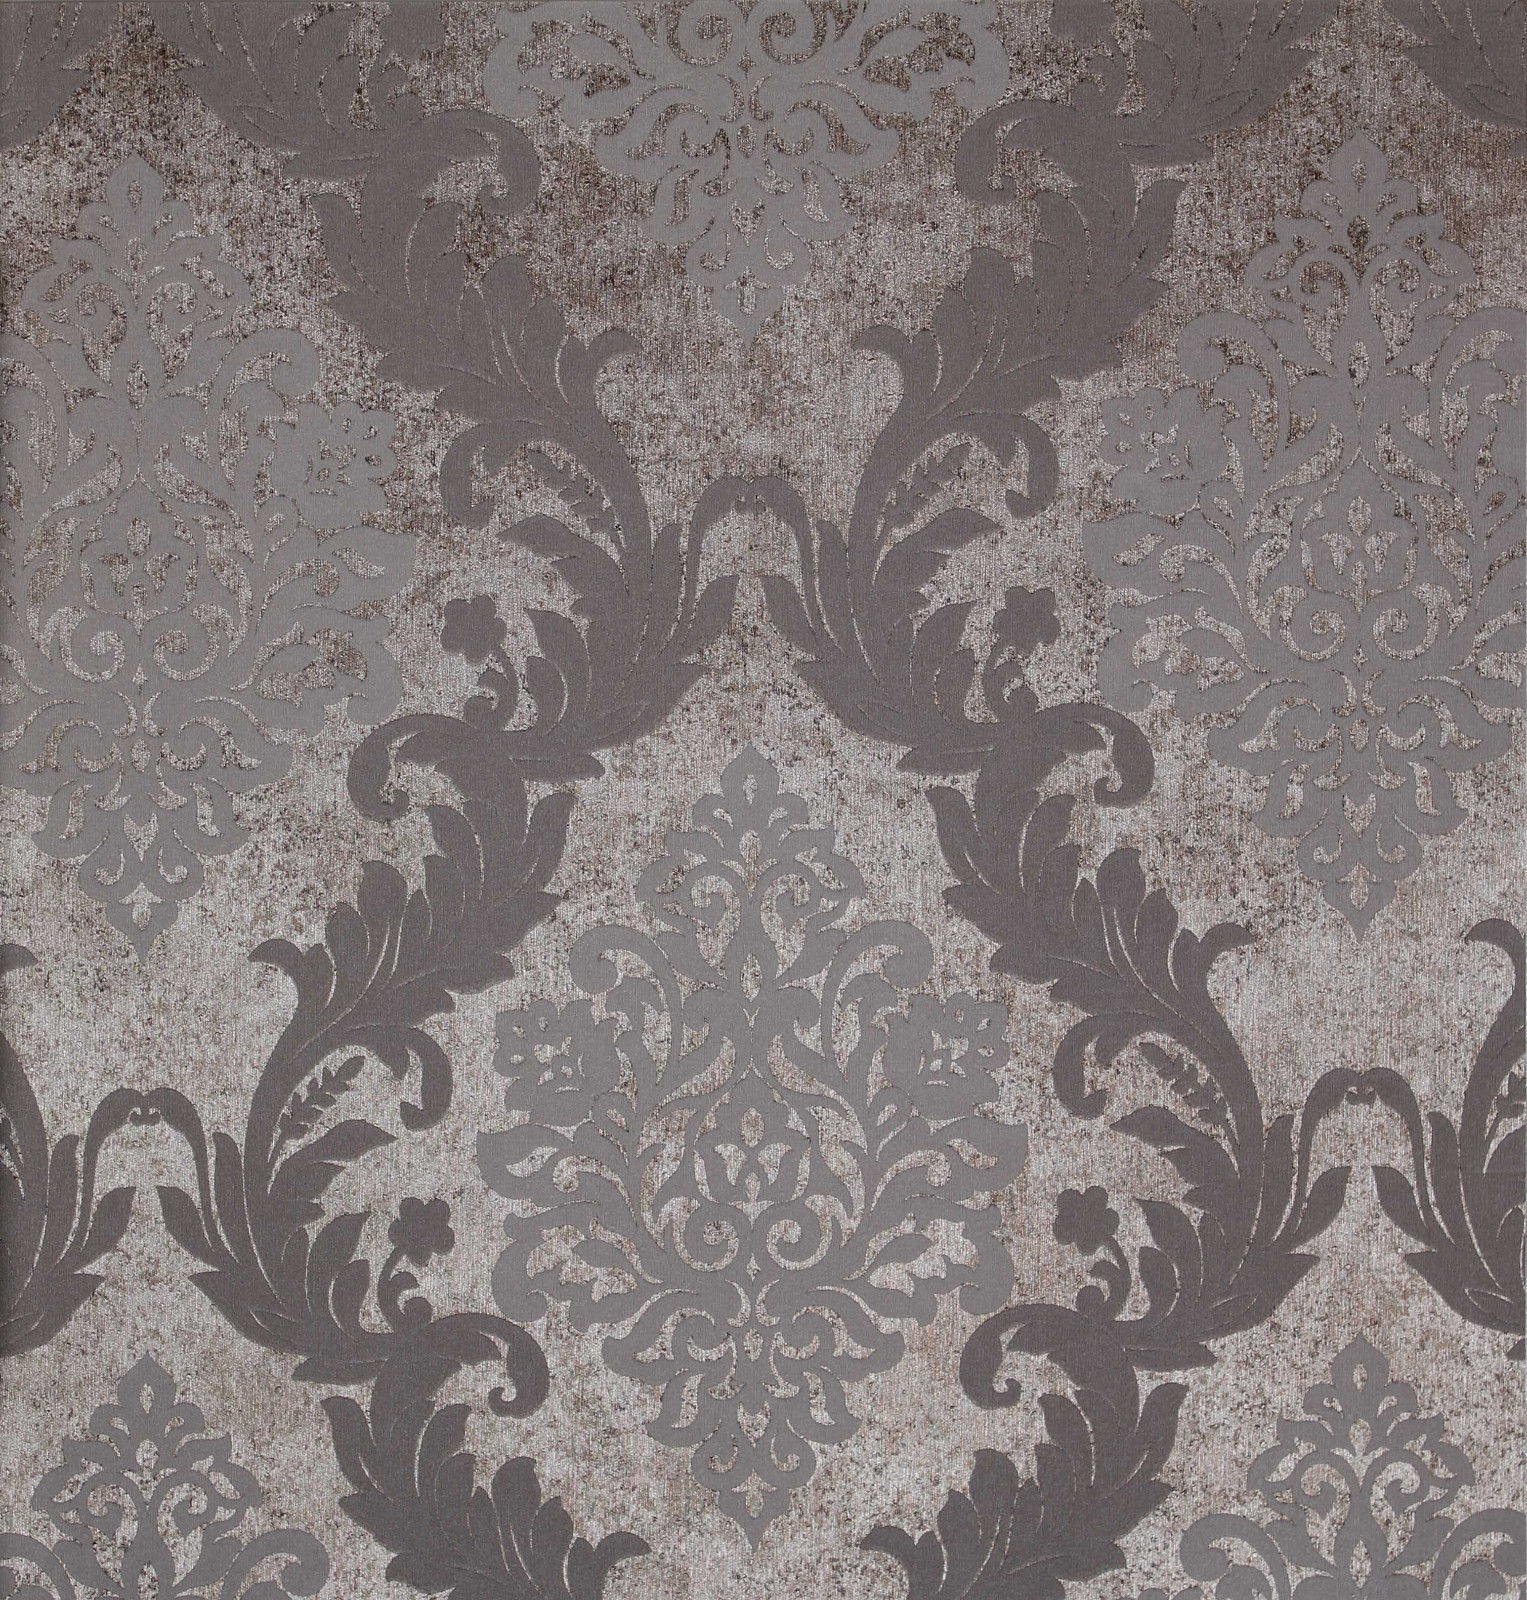 gray silver wallpaper wallpapersafari. Black Bedroom Furniture Sets. Home Design Ideas